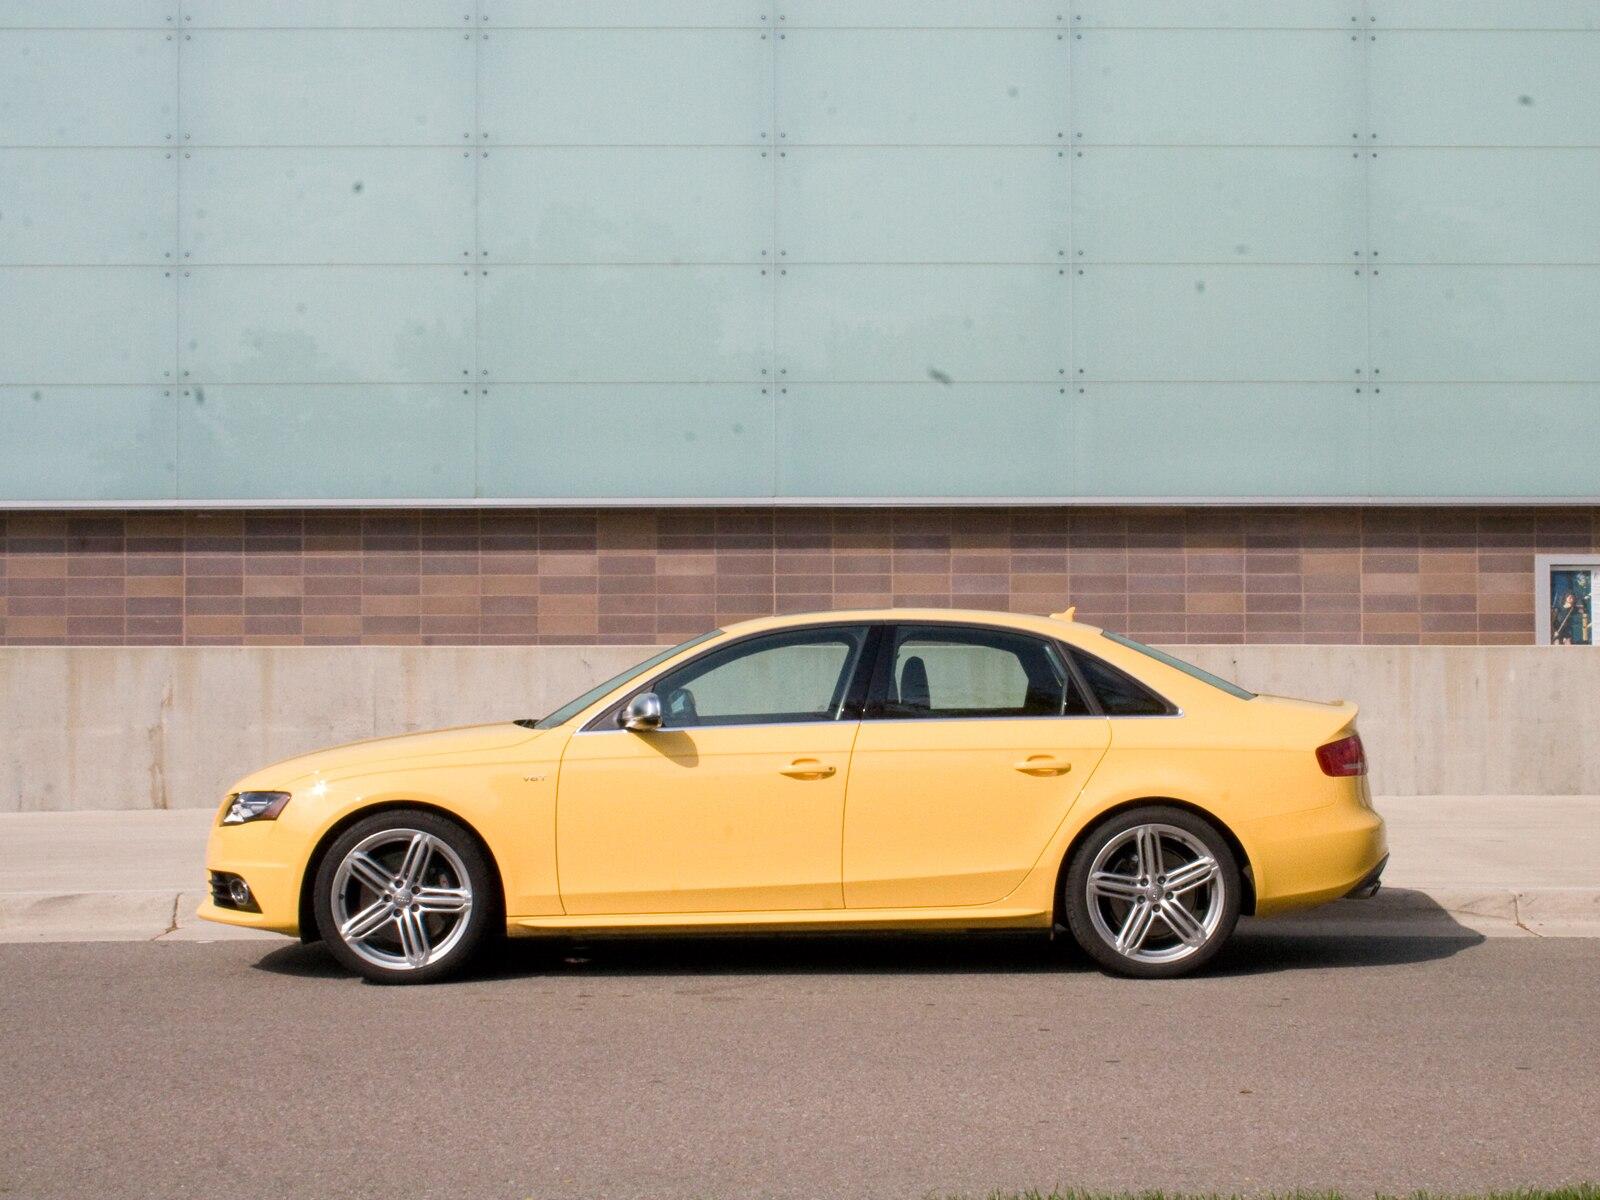 0911 01 Z 2010 Audi S4 Side View